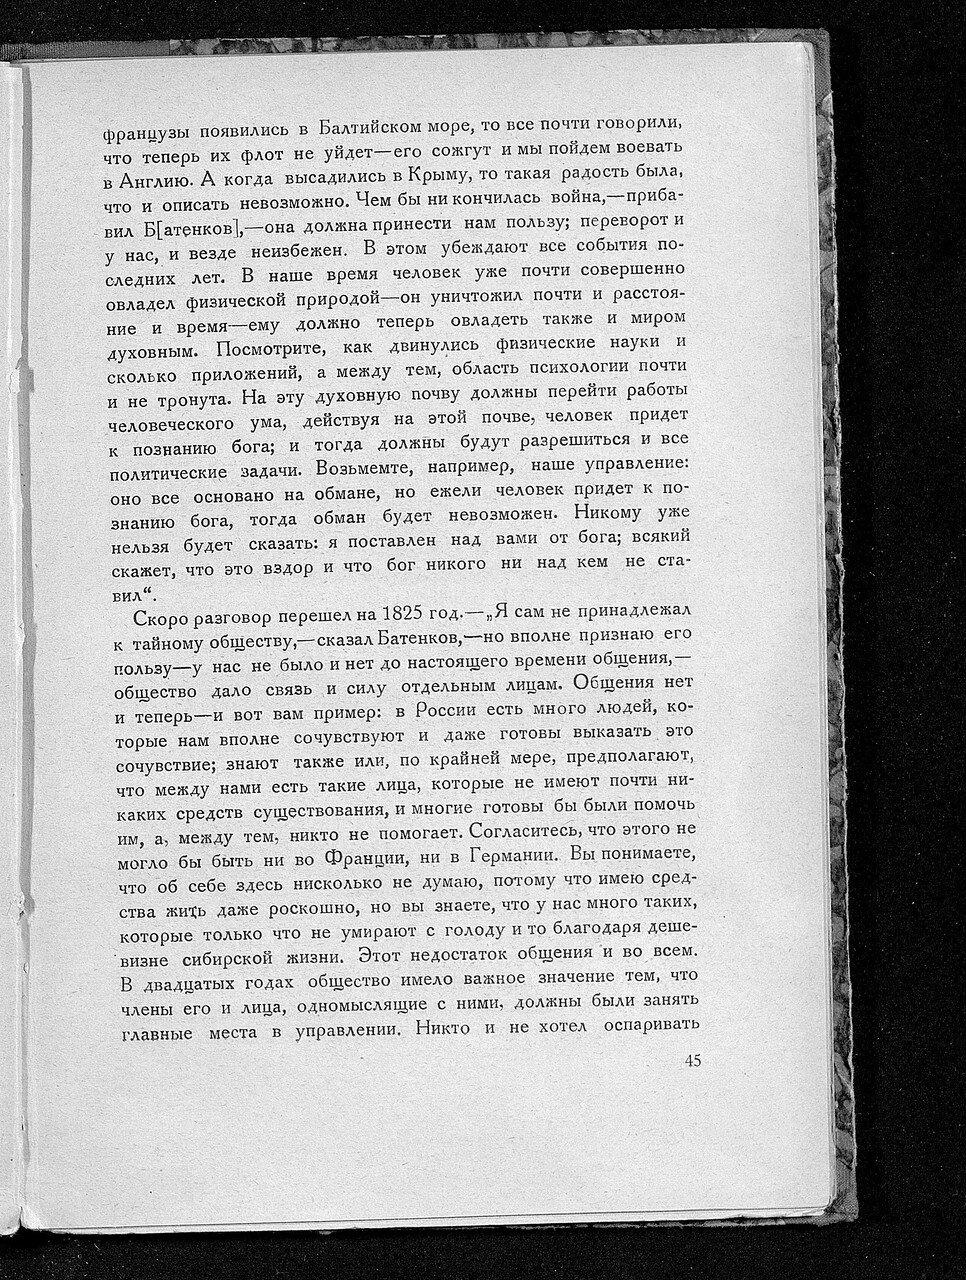 https://img-fotki.yandex.ru/get/893904/199368979.a0/0_214328_5ac81cf1_XXXL.jpg